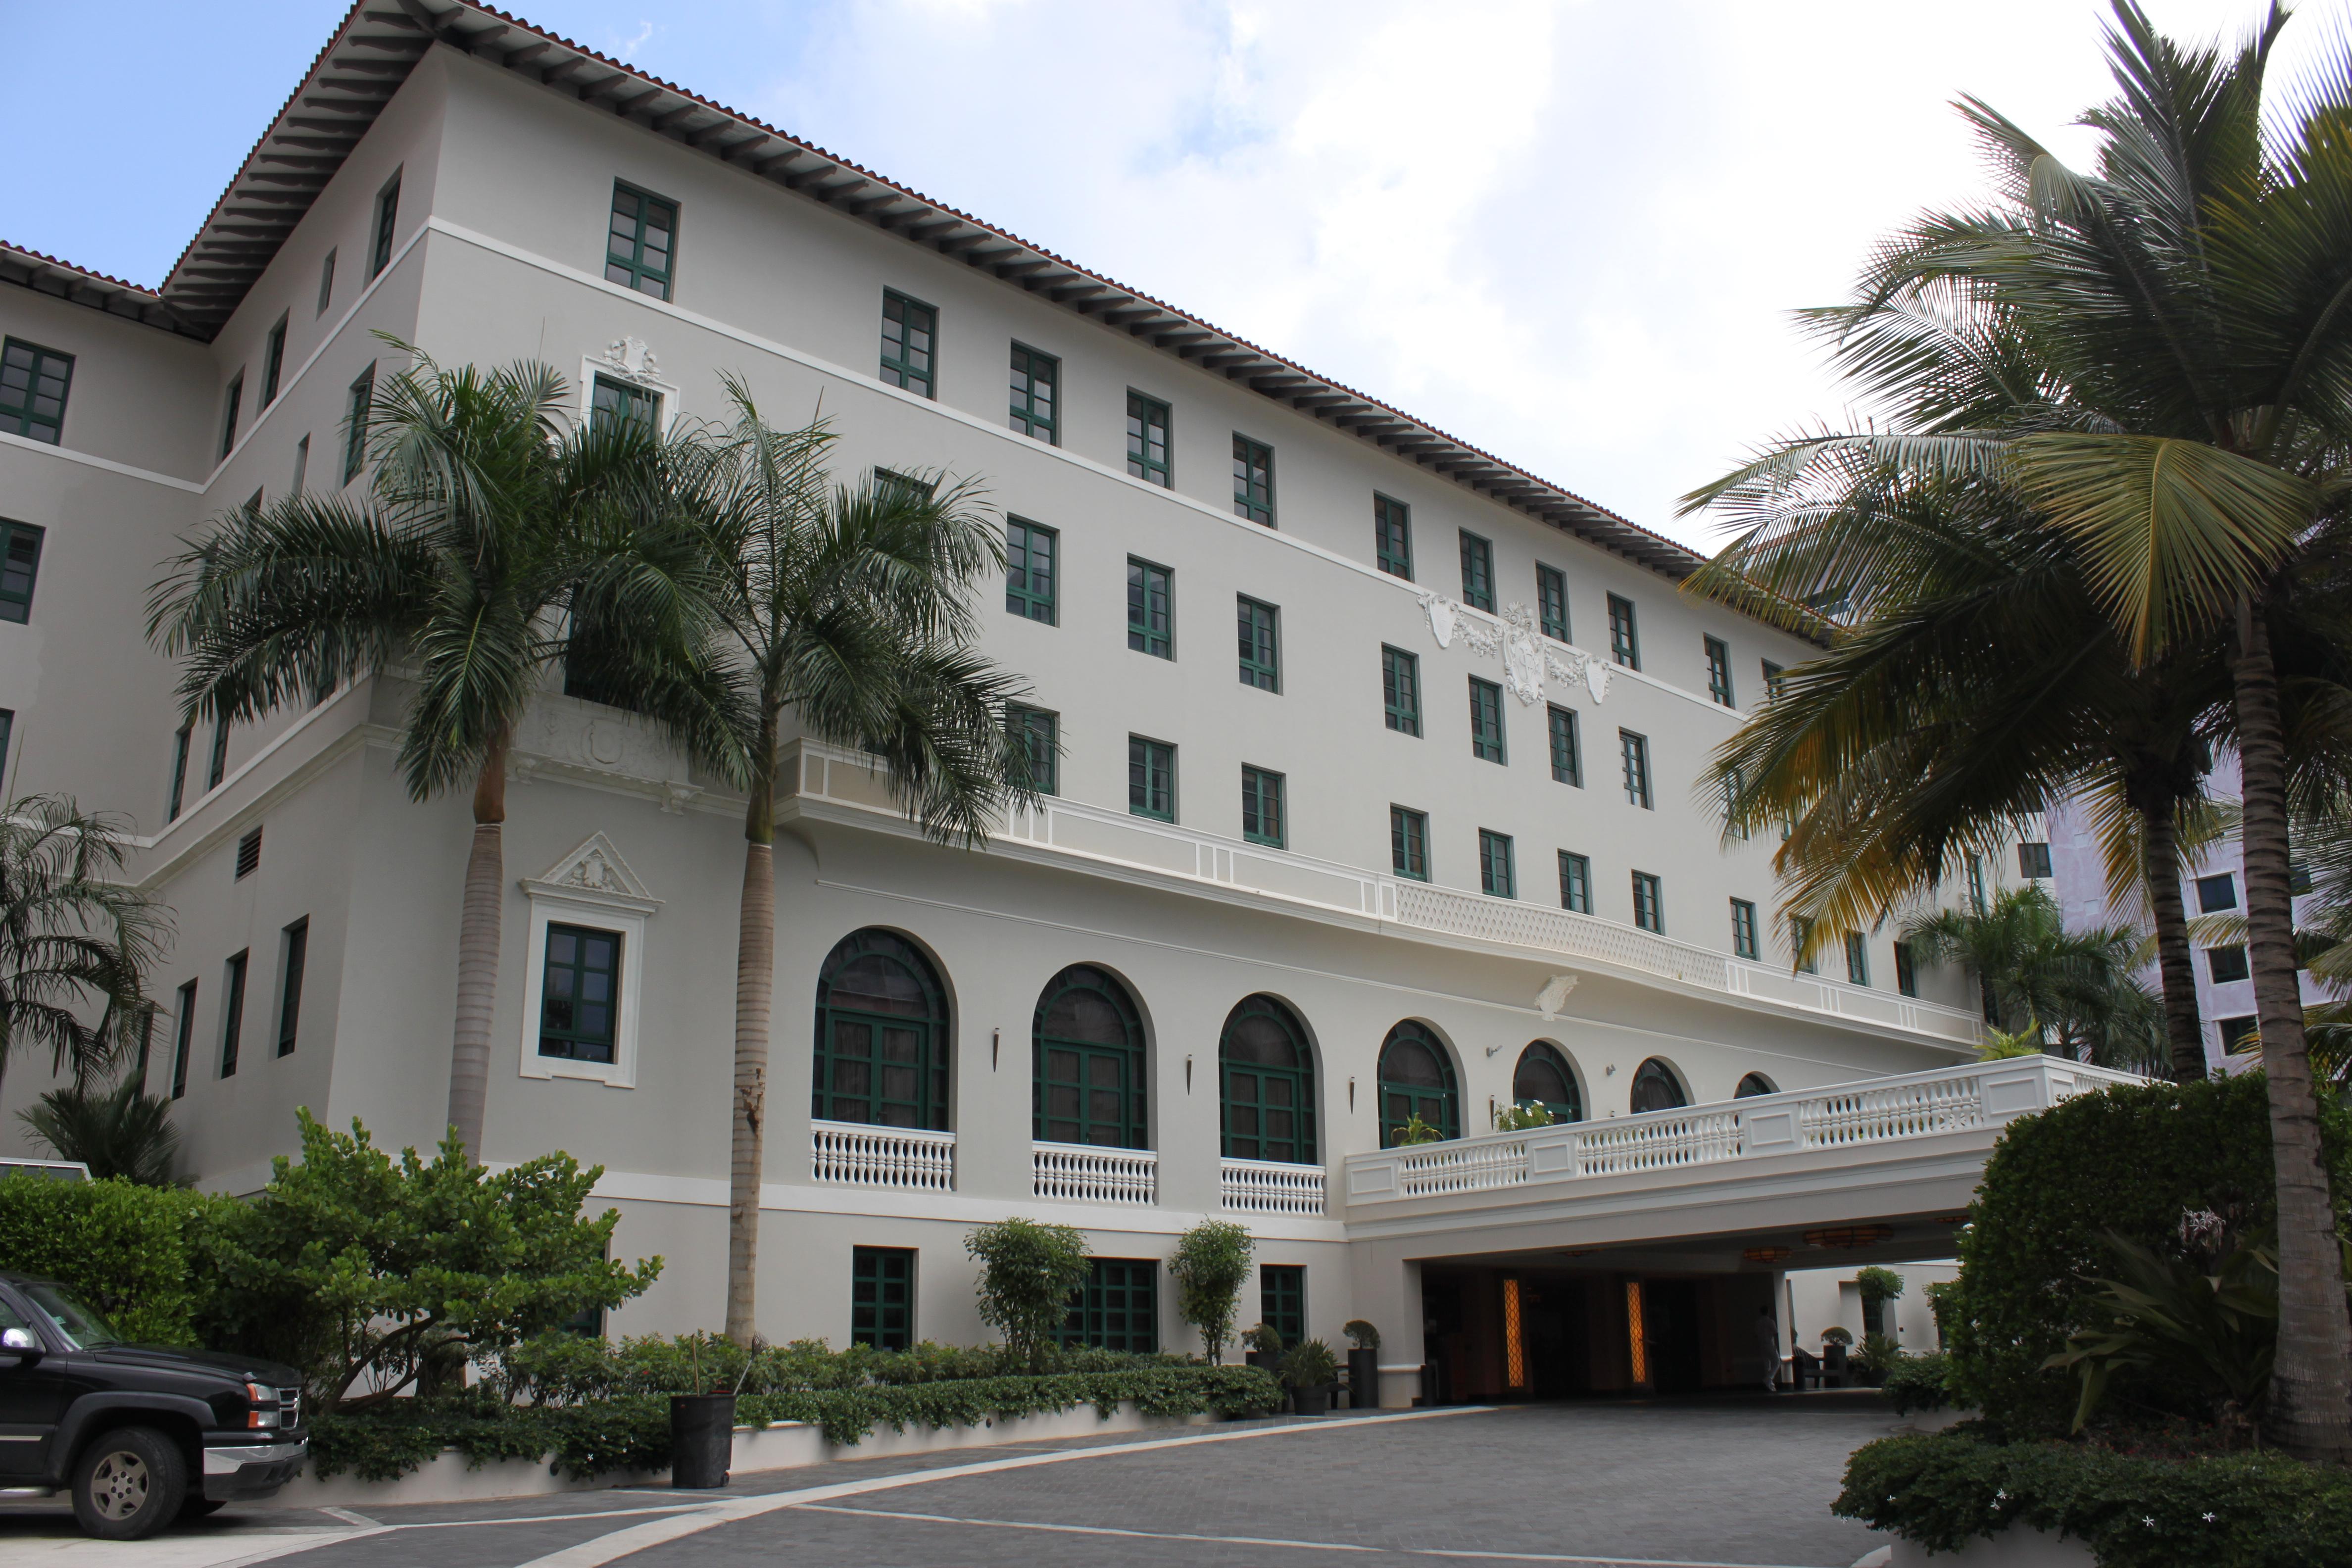 Condado Vanderbilt Hotel - Wikipedia